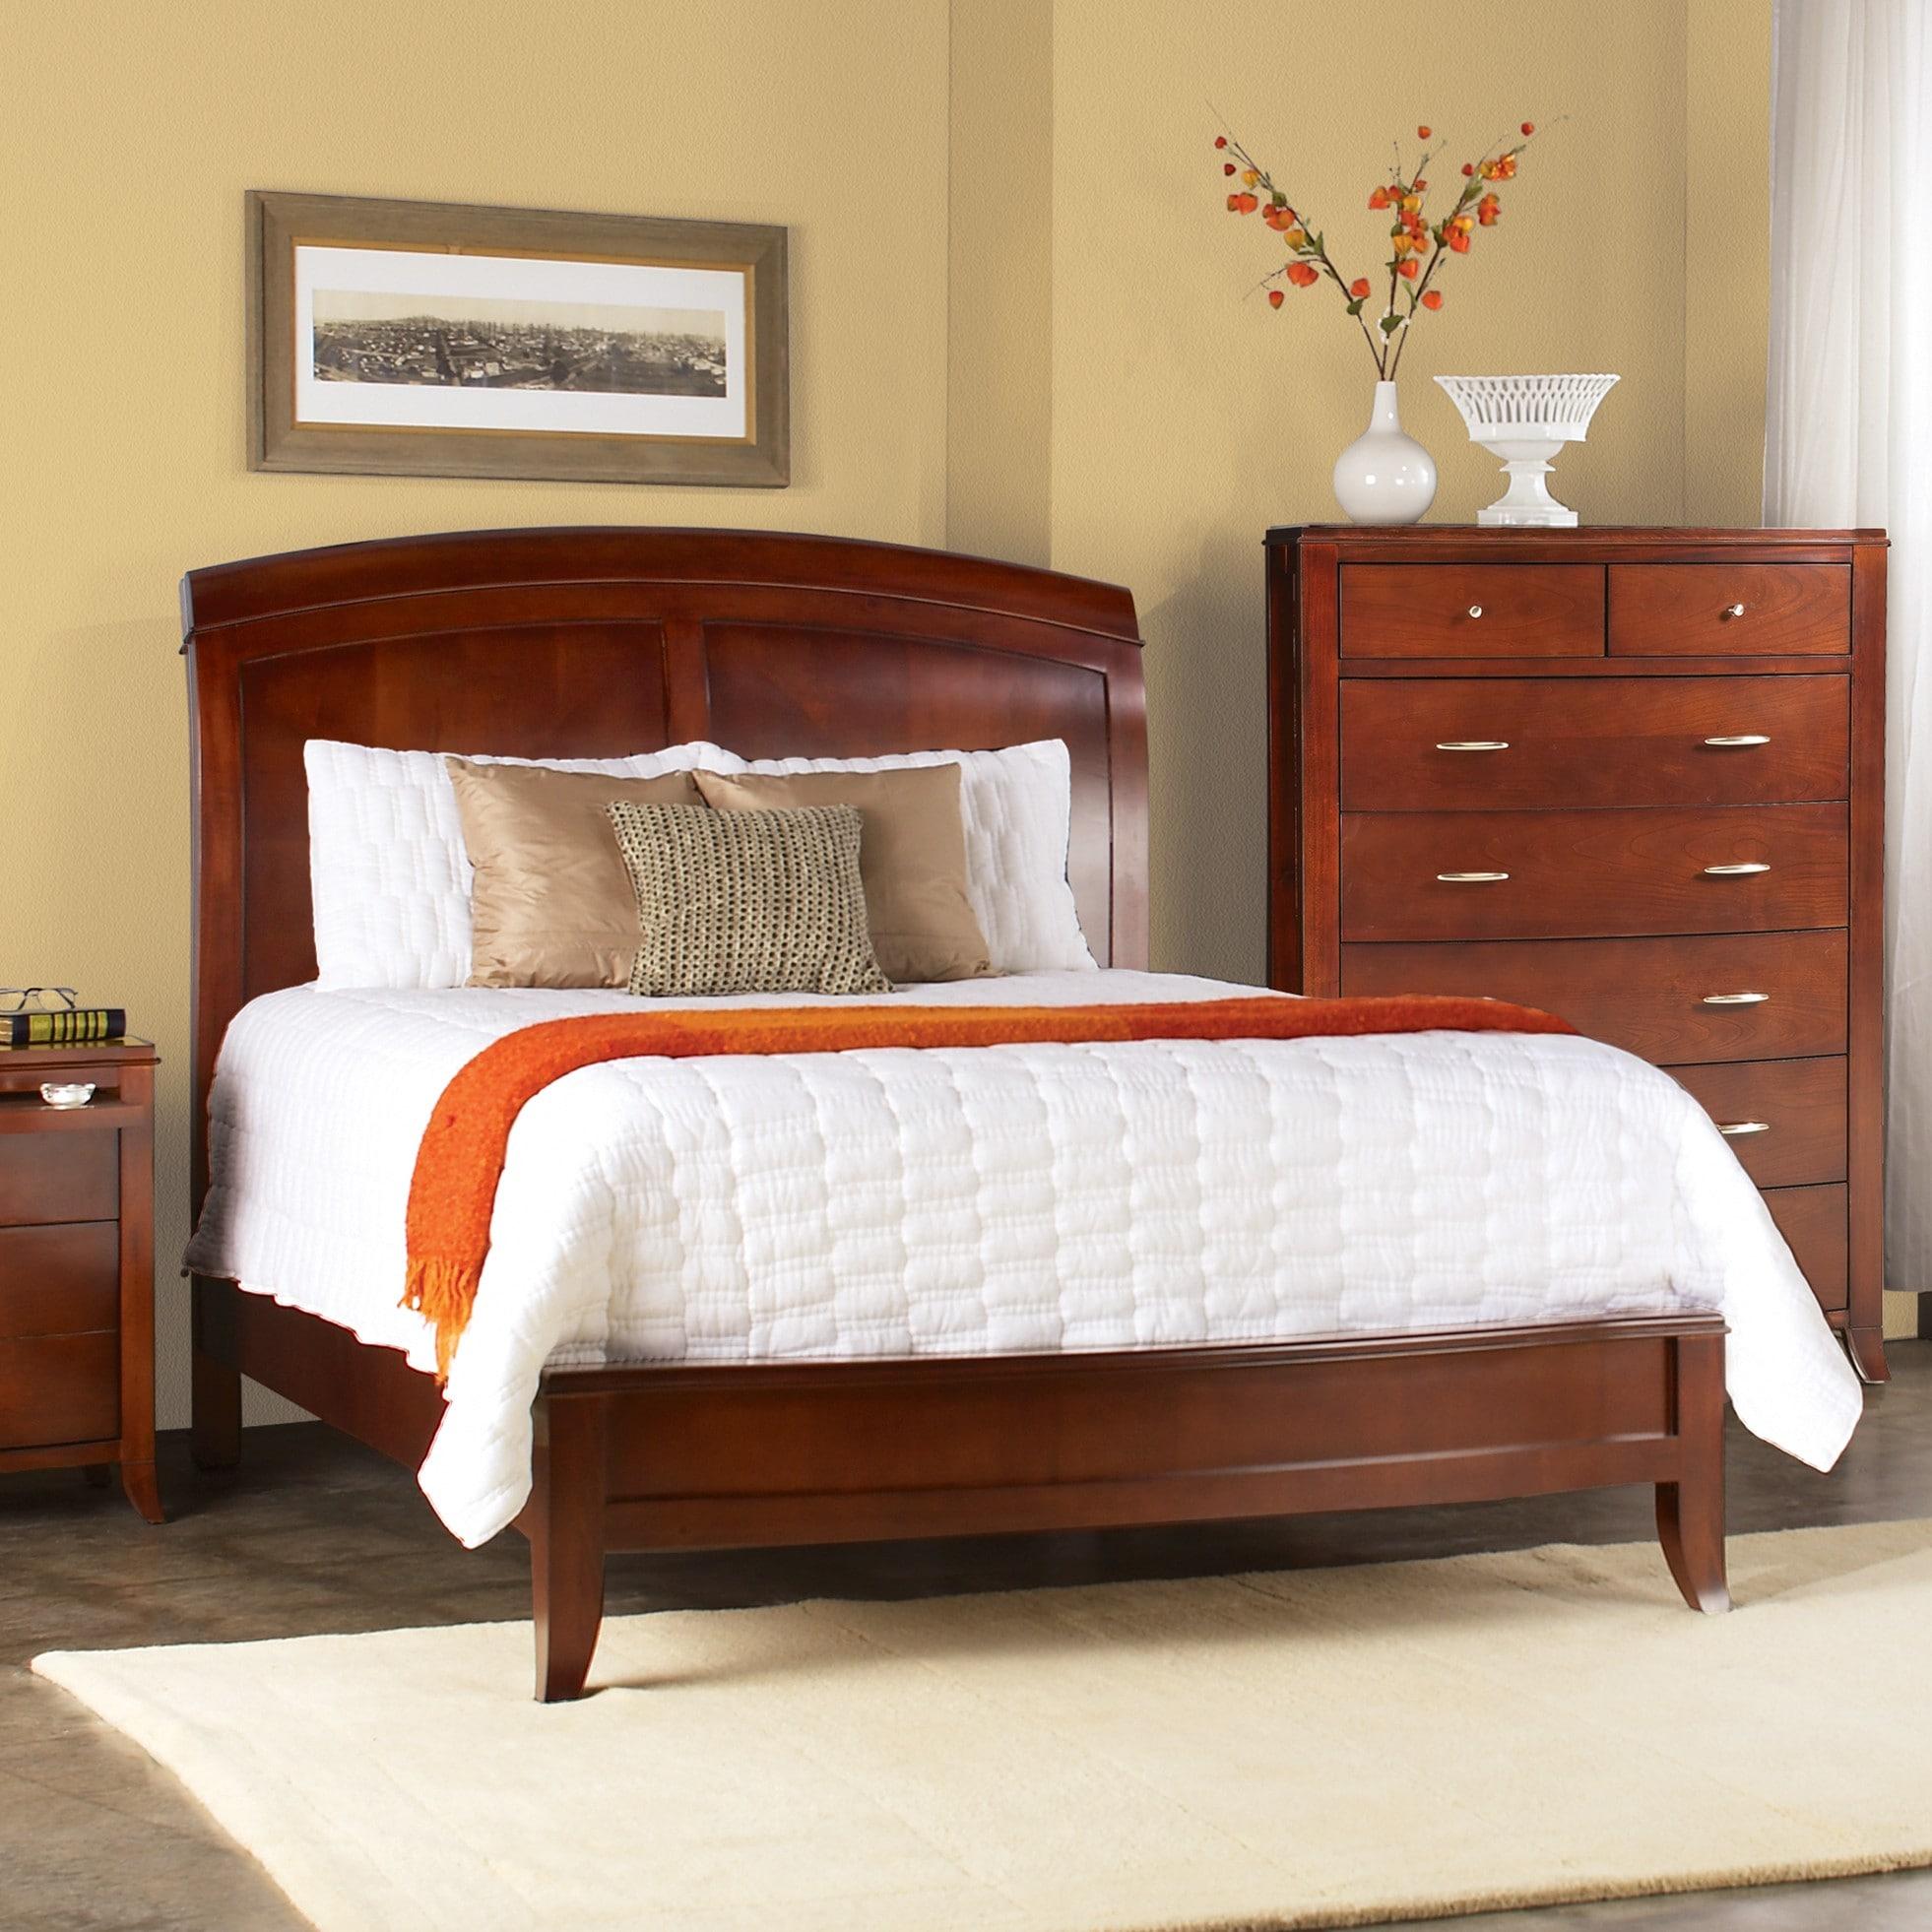 Shop Split Panel Full Size Wooden Sleigh Bed Overstock 3140681